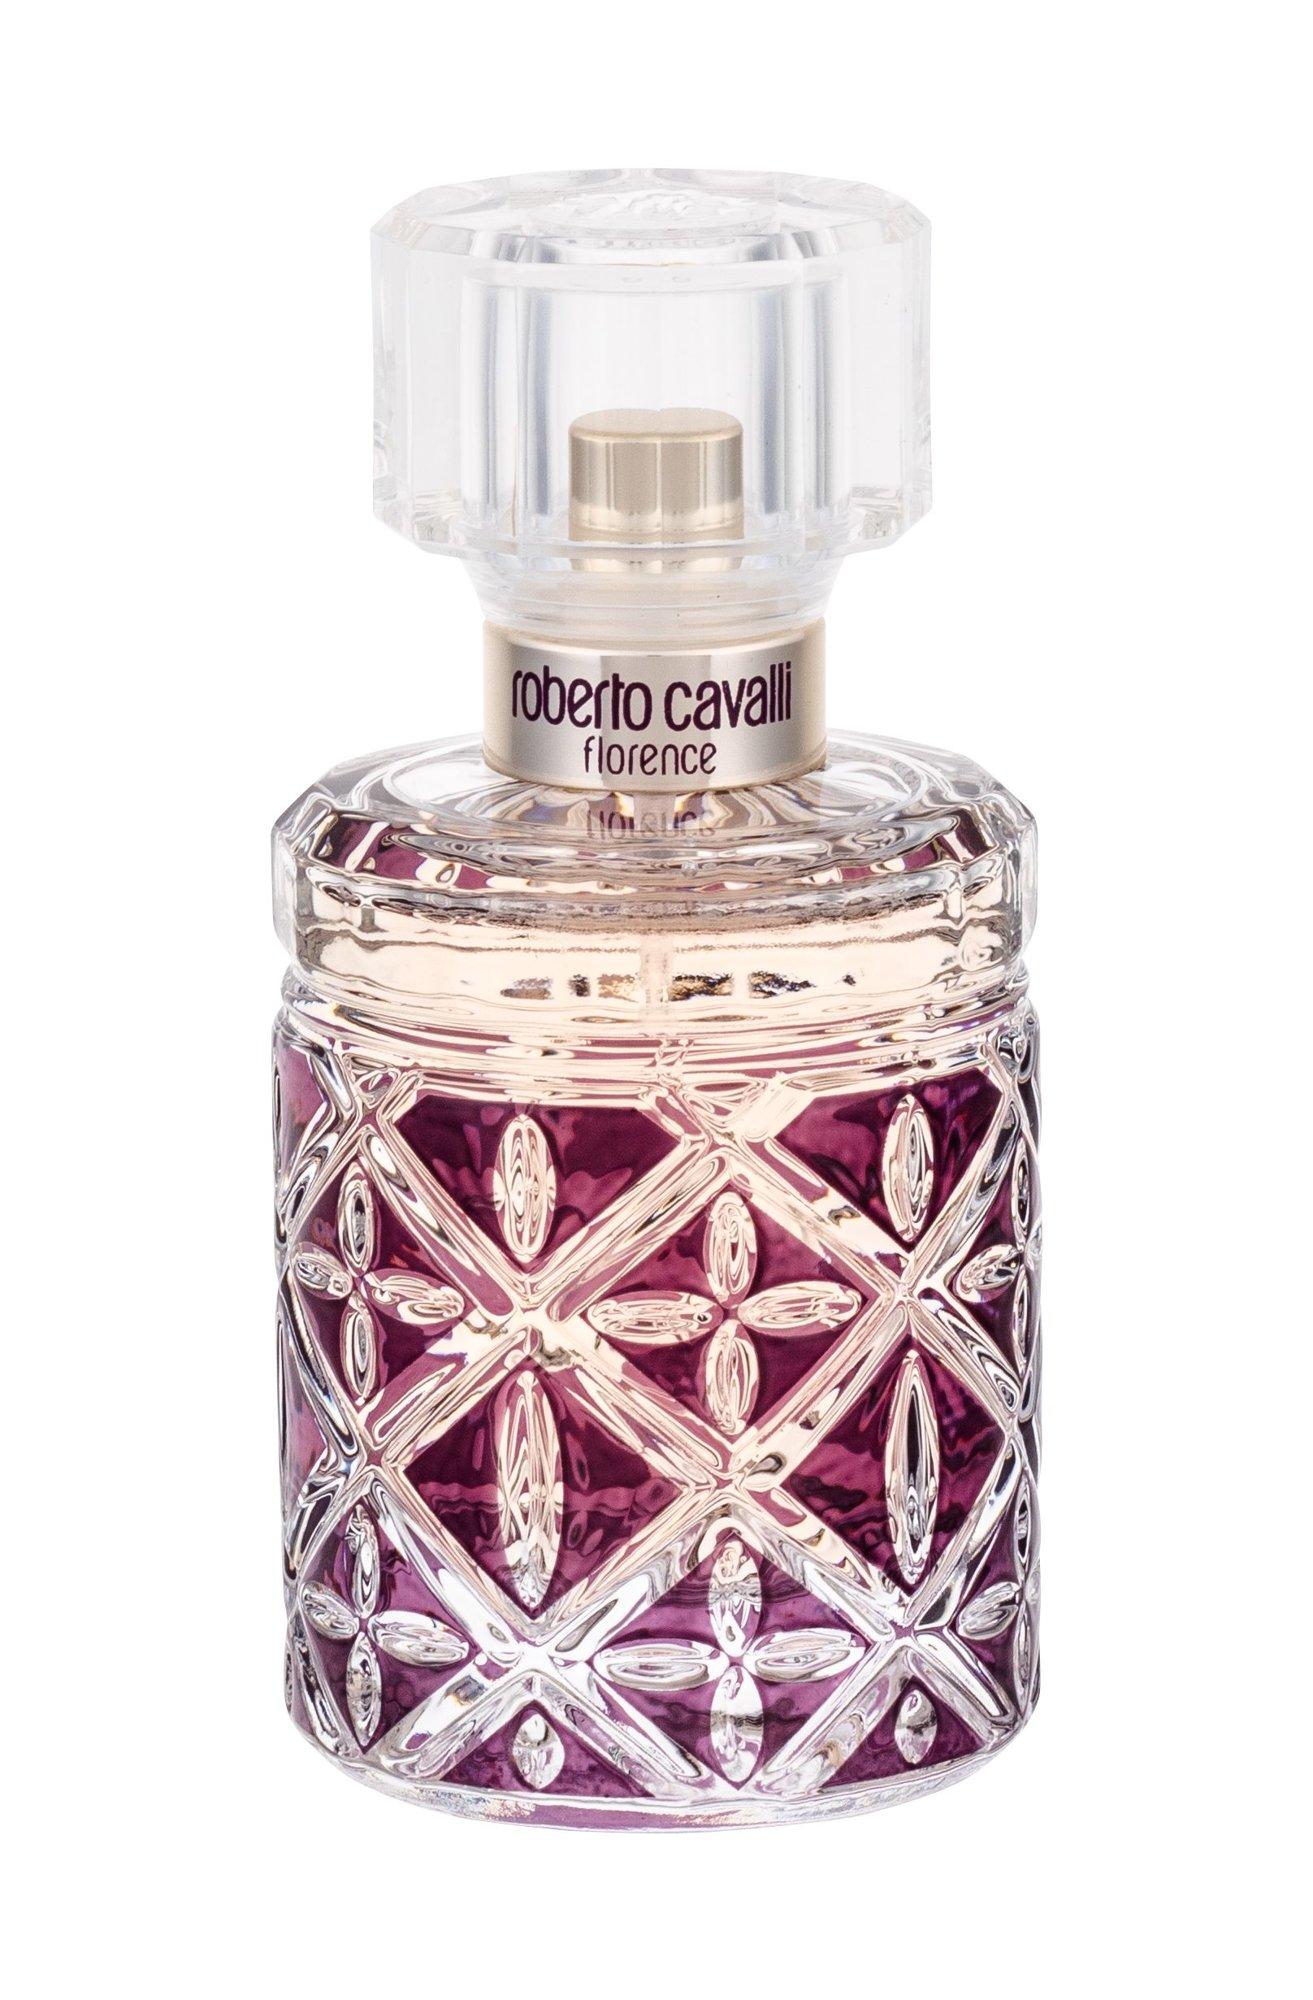 Roberto Cavalli Florence Eau de Parfum 50ml